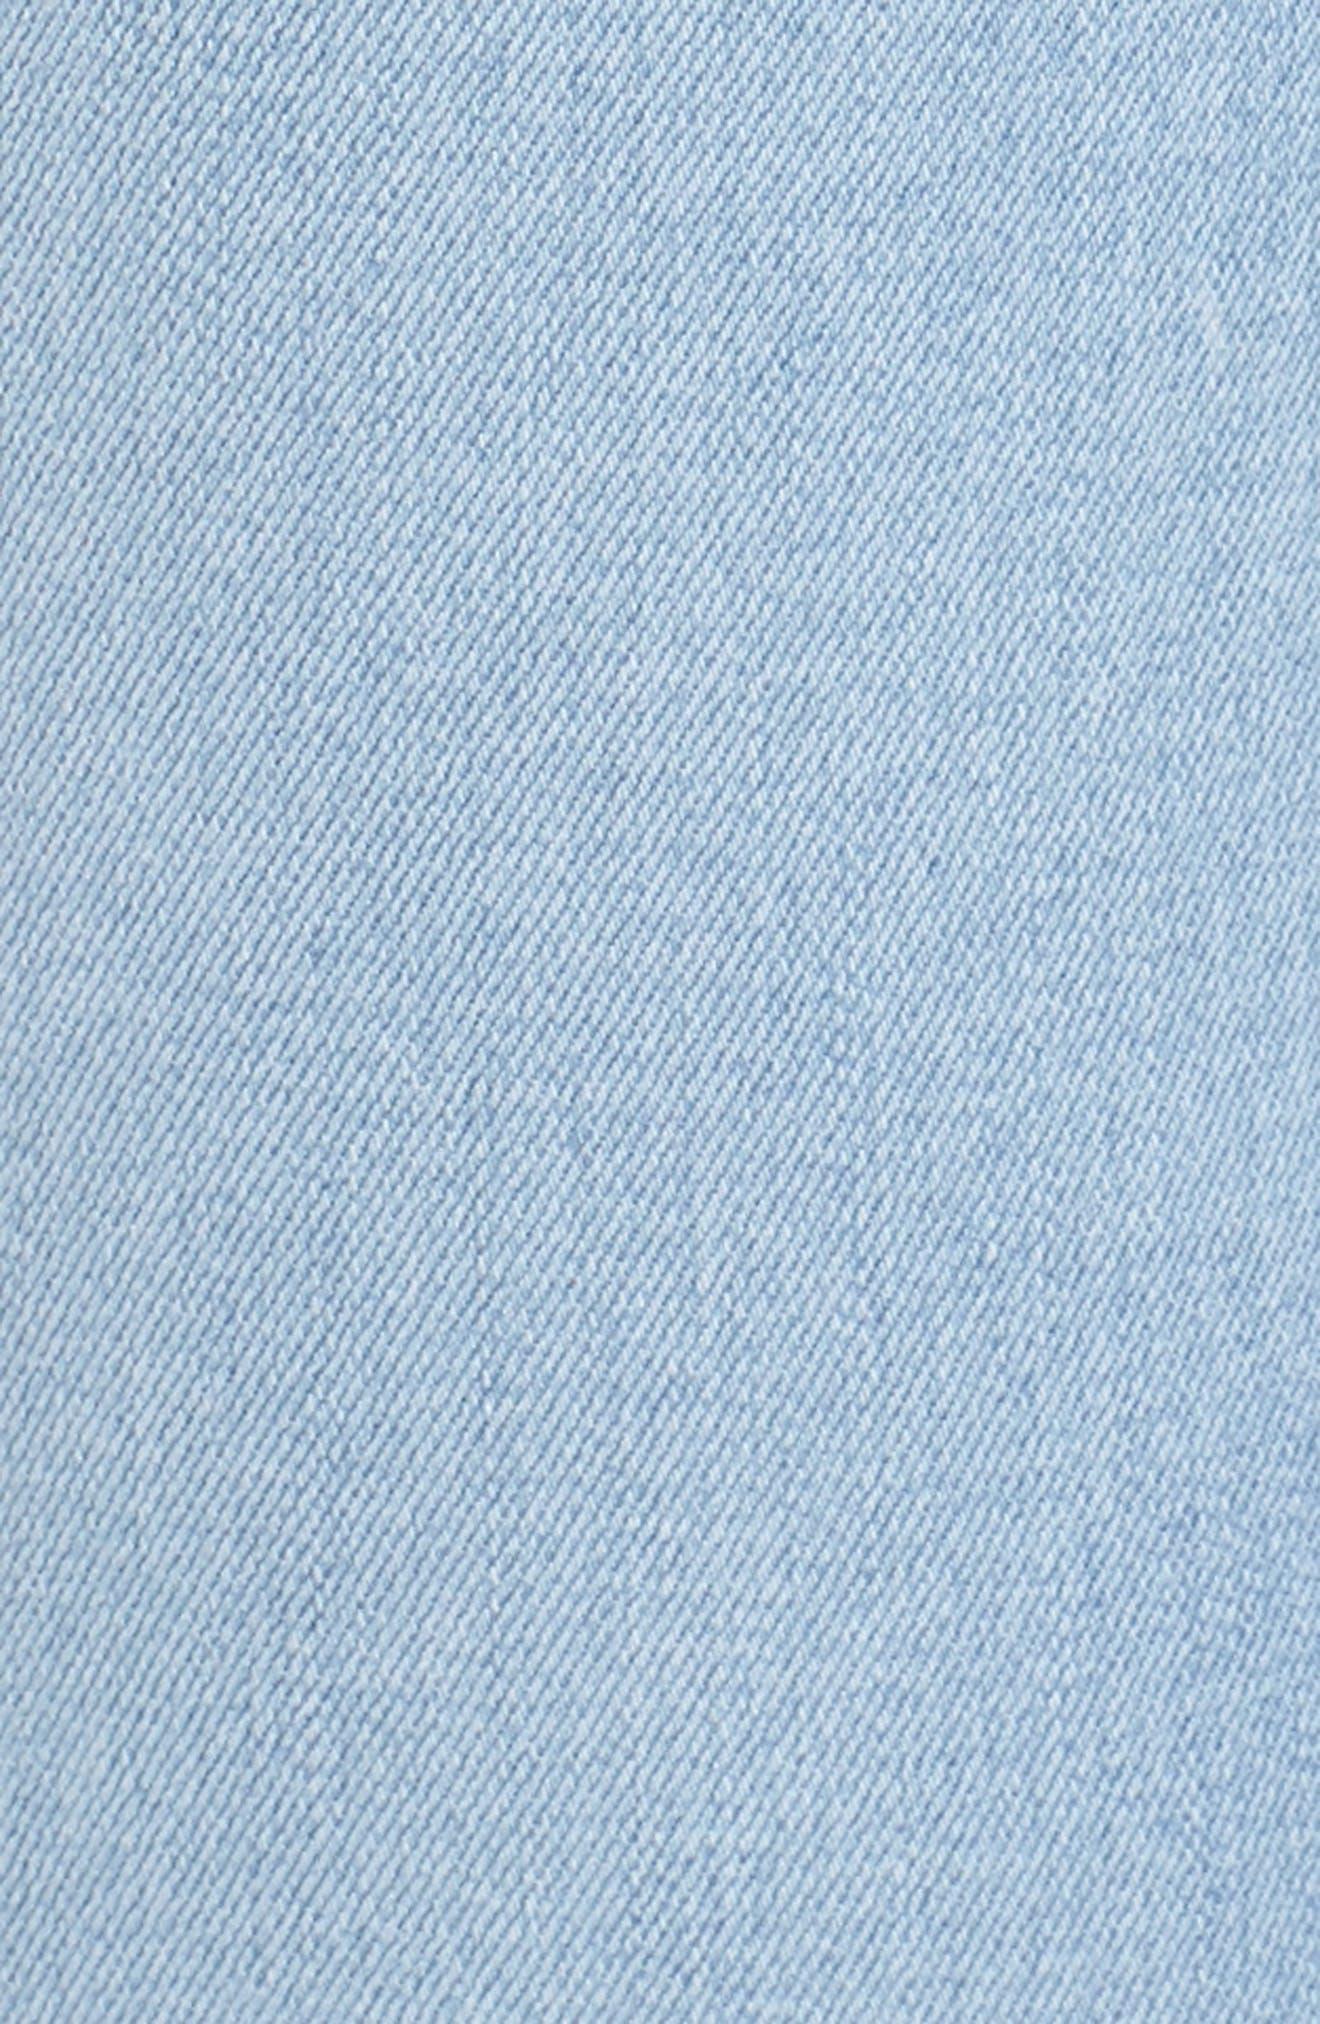 Release Hem Skinny Jeans,                             Alternate thumbnail 6, color,                             Ashley